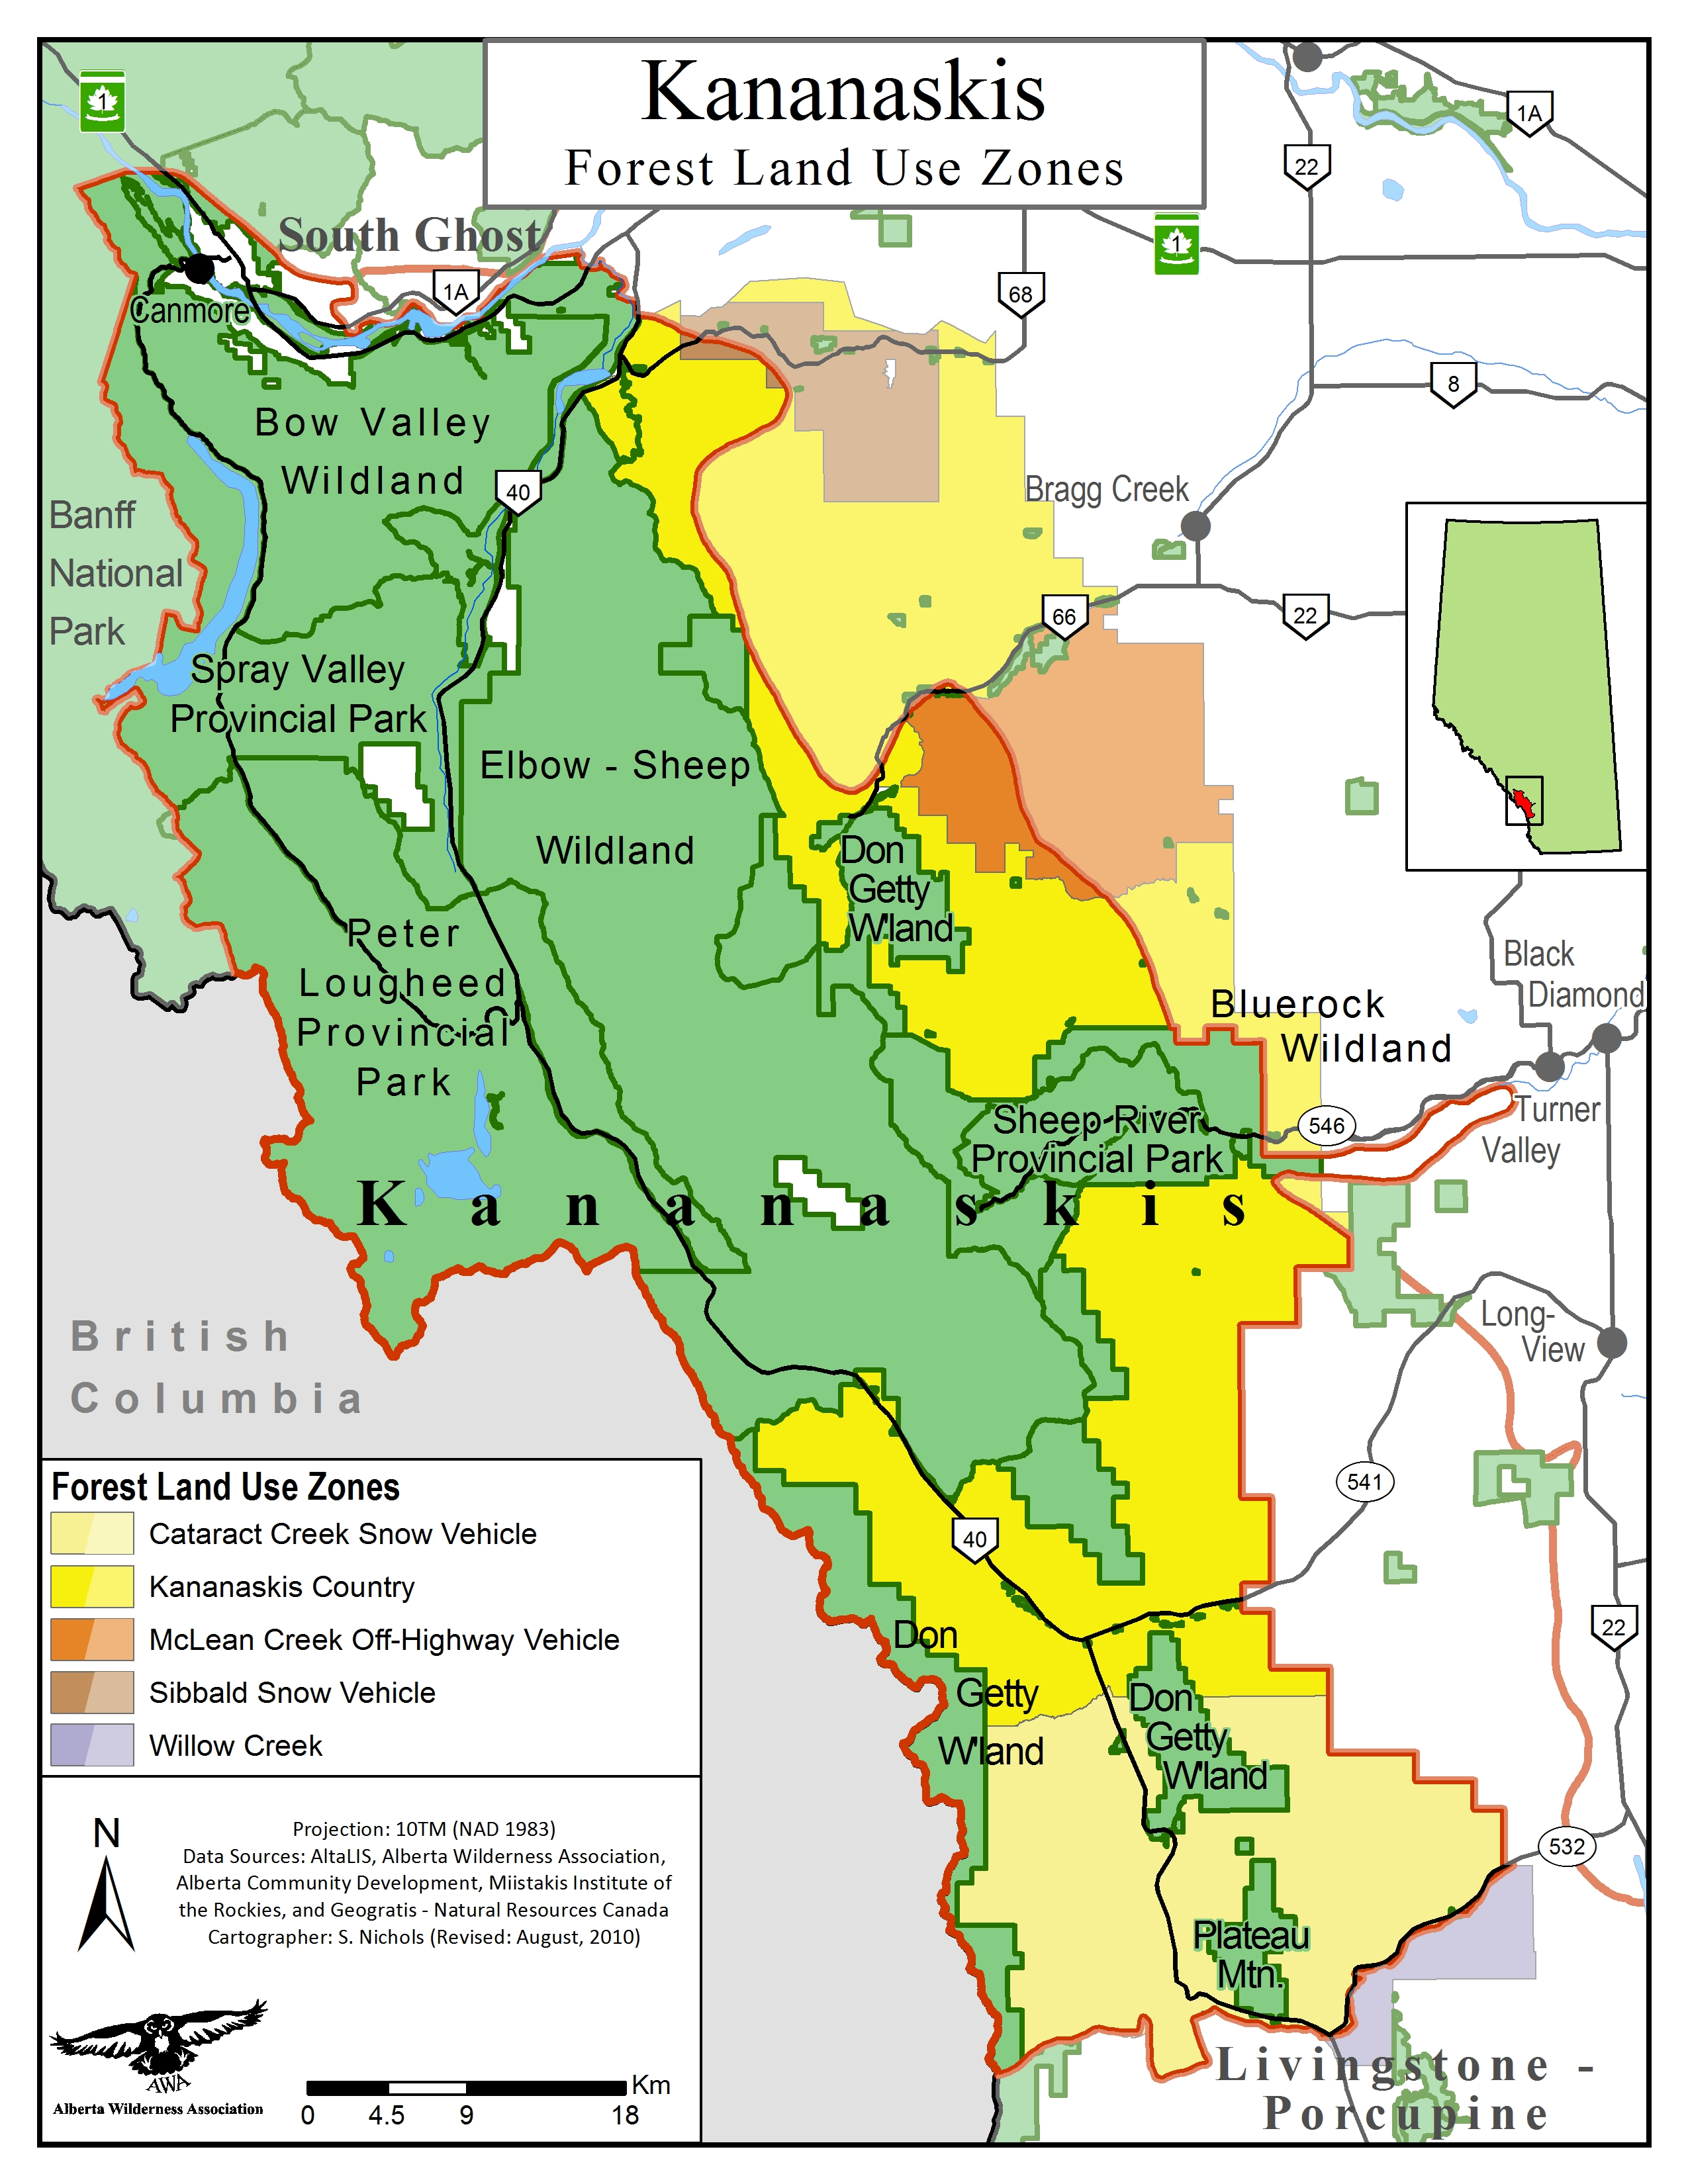 Kananaskis - Alberta Wilderness Association